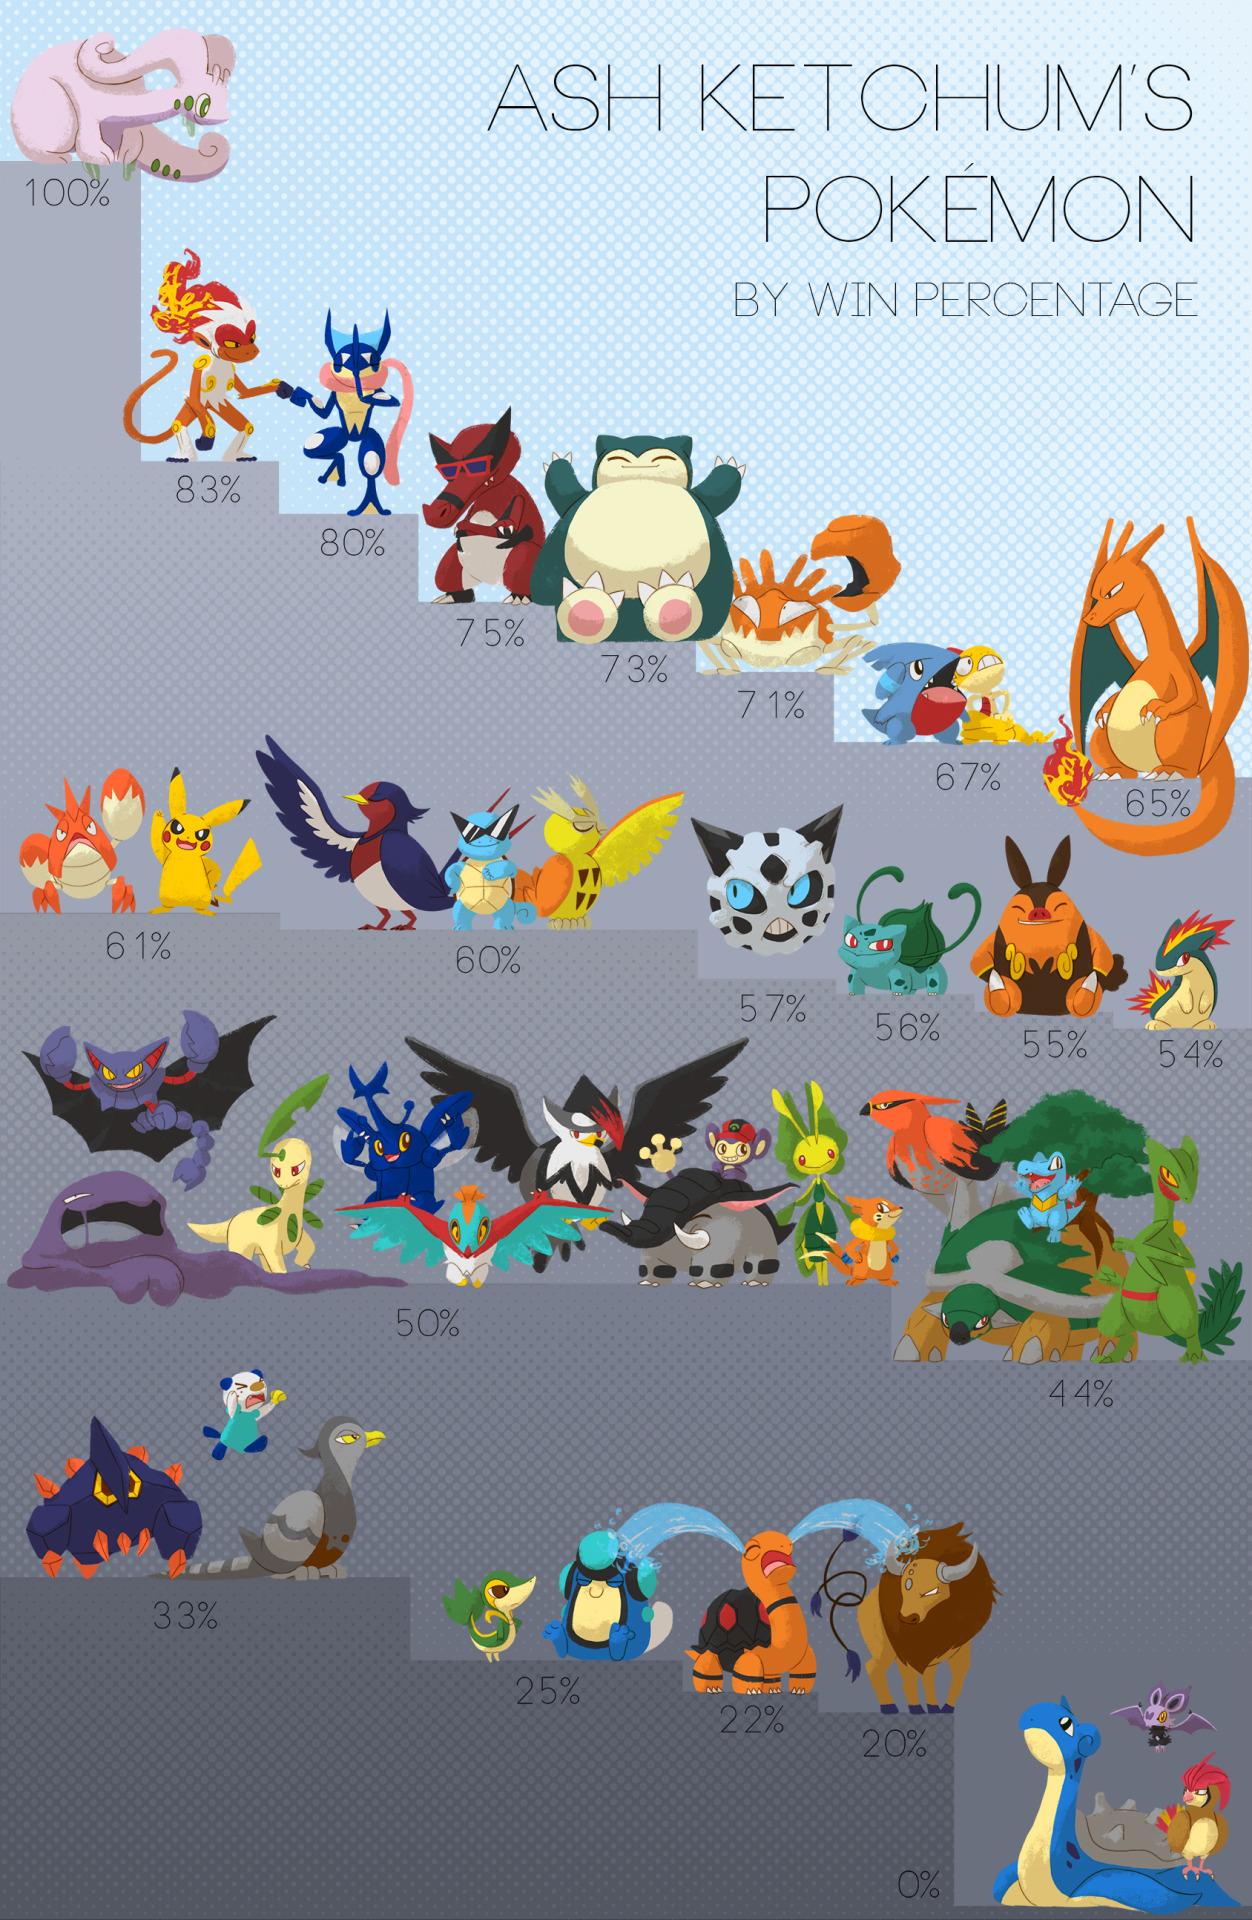 Ash Ketchum's Pokémon